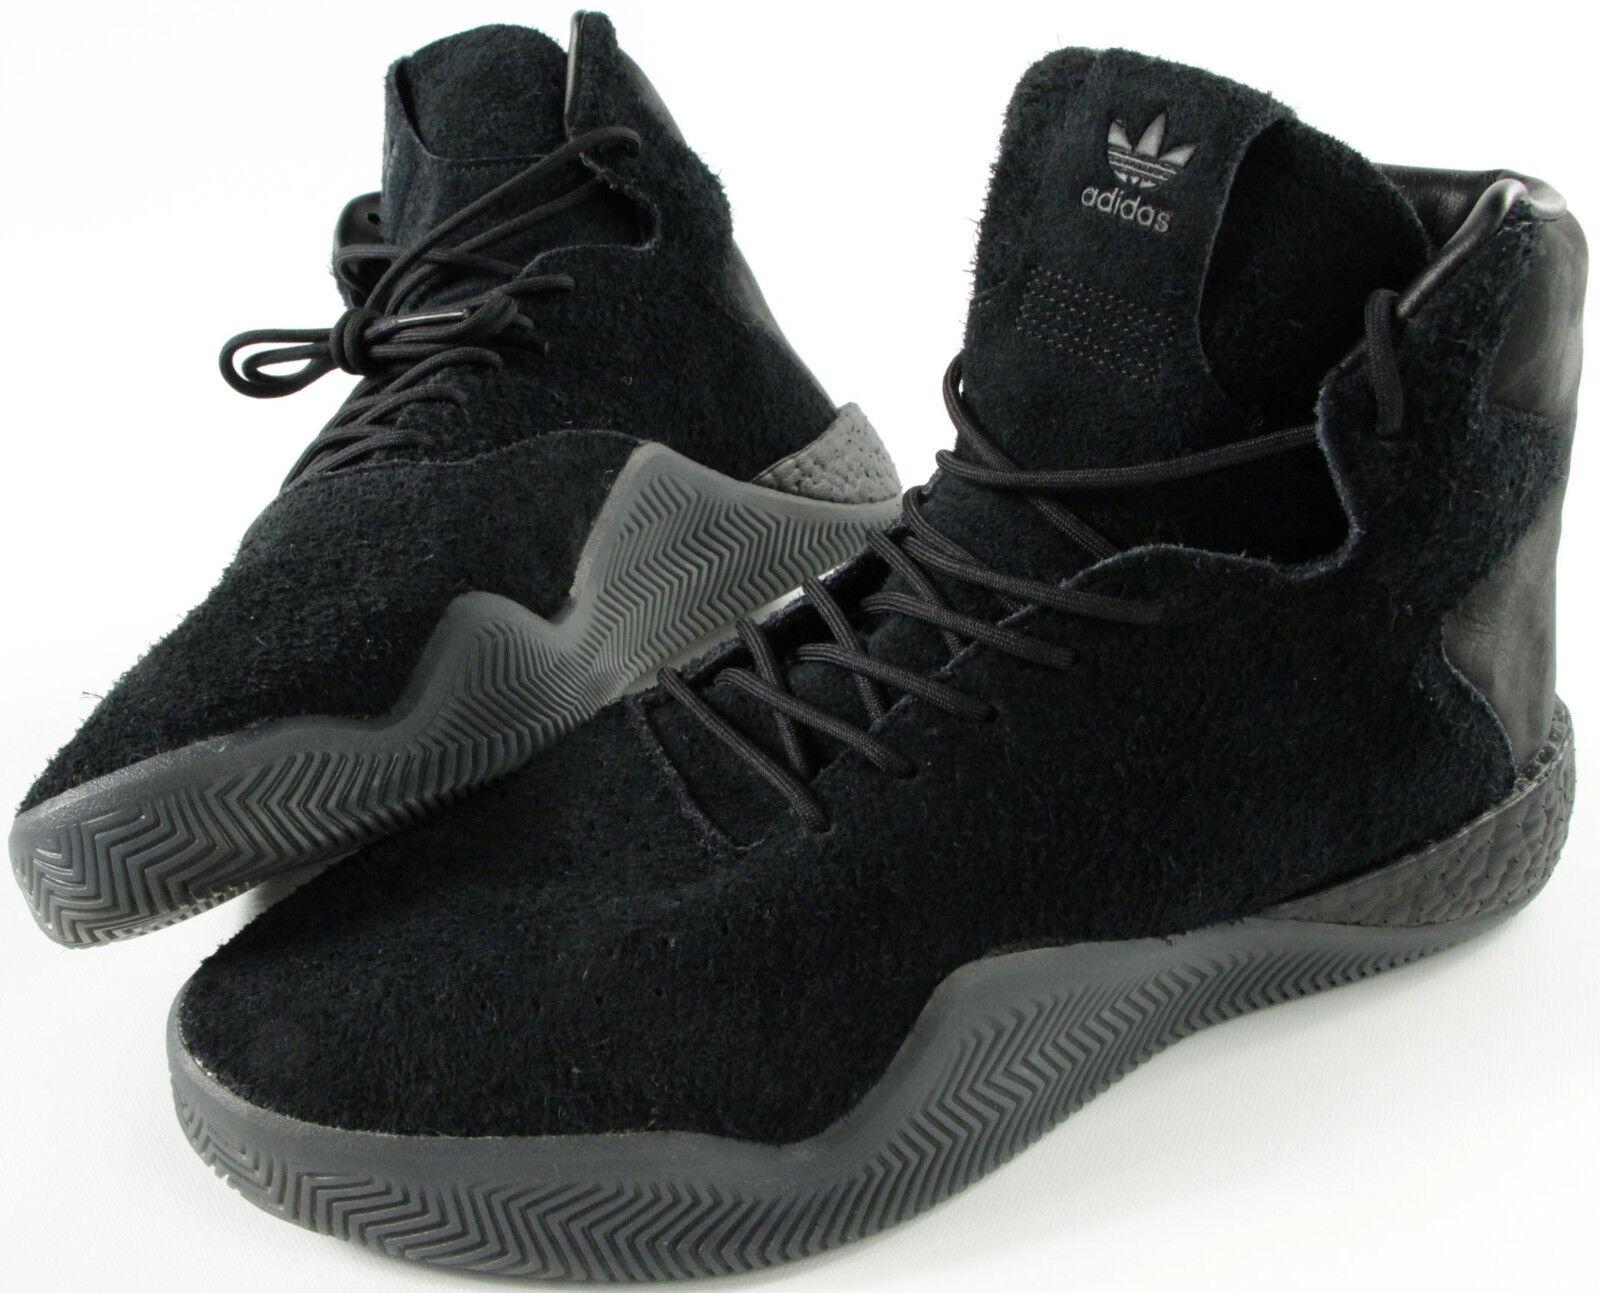 ADIDAS ORIGINALS Tubular Instinct BOOST all black shoes- 12.5- NEW- basketball-